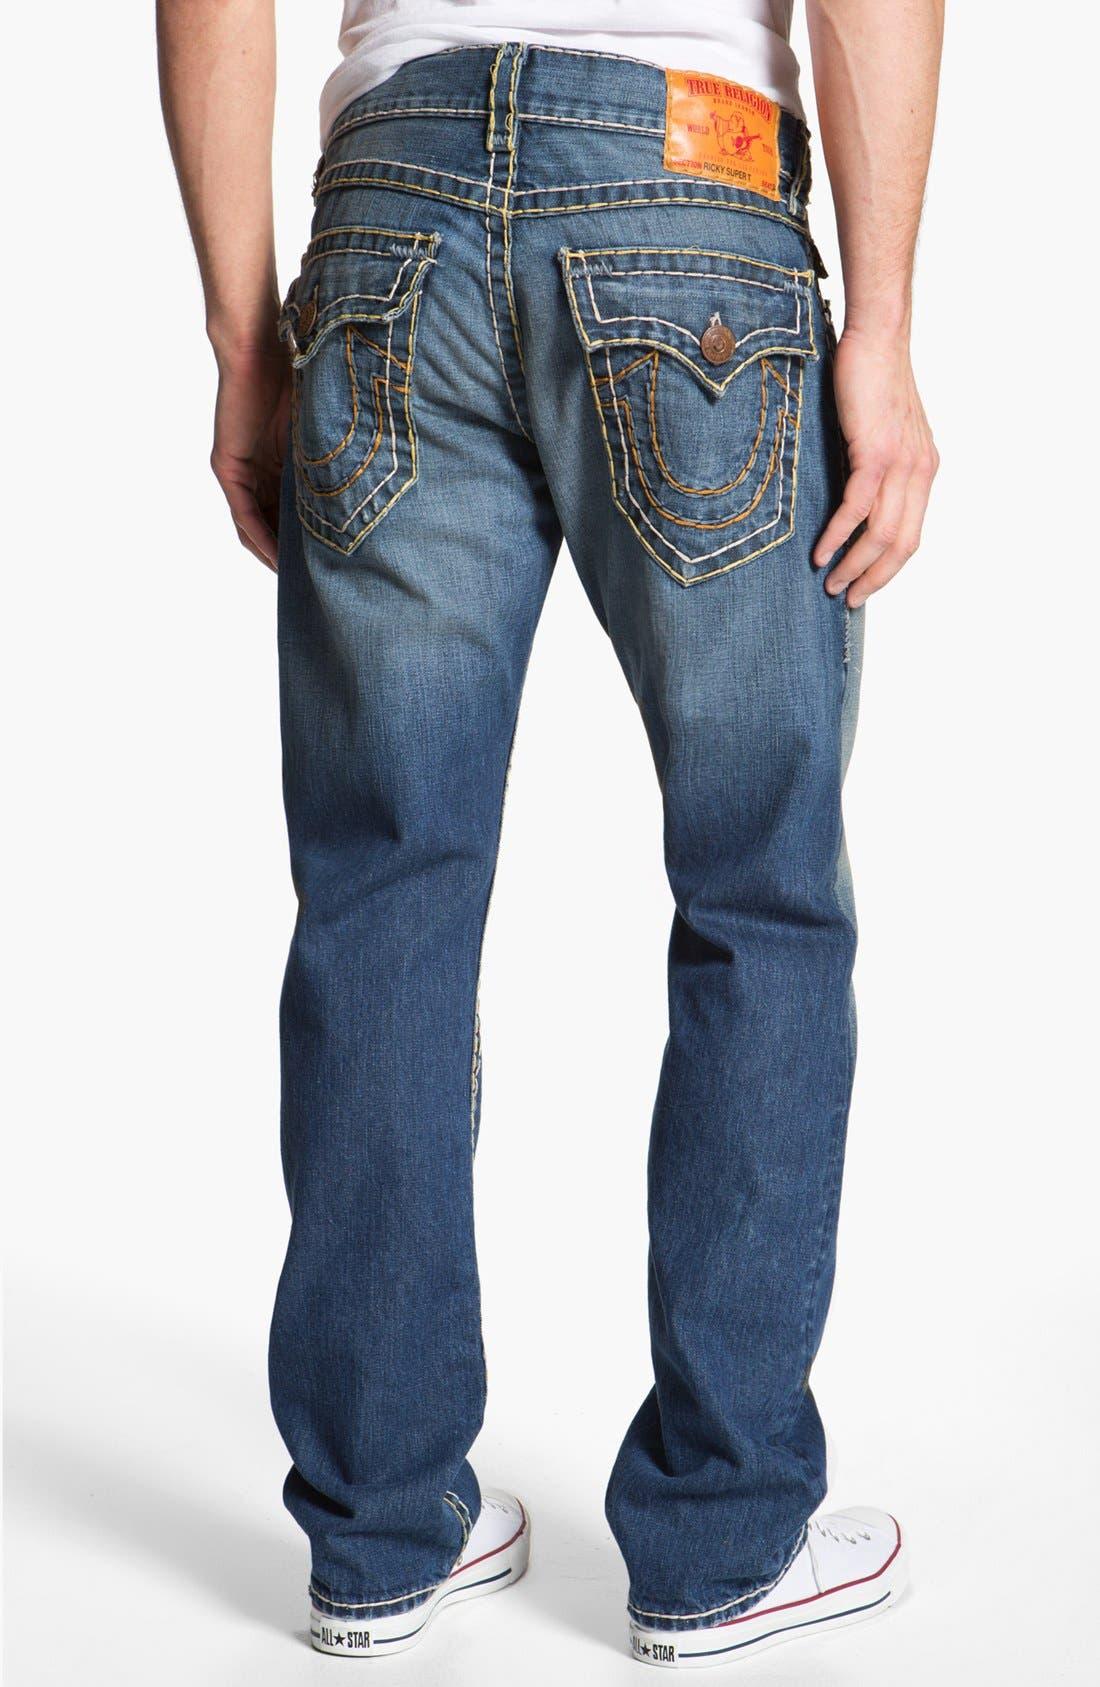 Main Image - True Religion Brand Jeans 'Ricky' Straight Leg Jeans (Tribute)